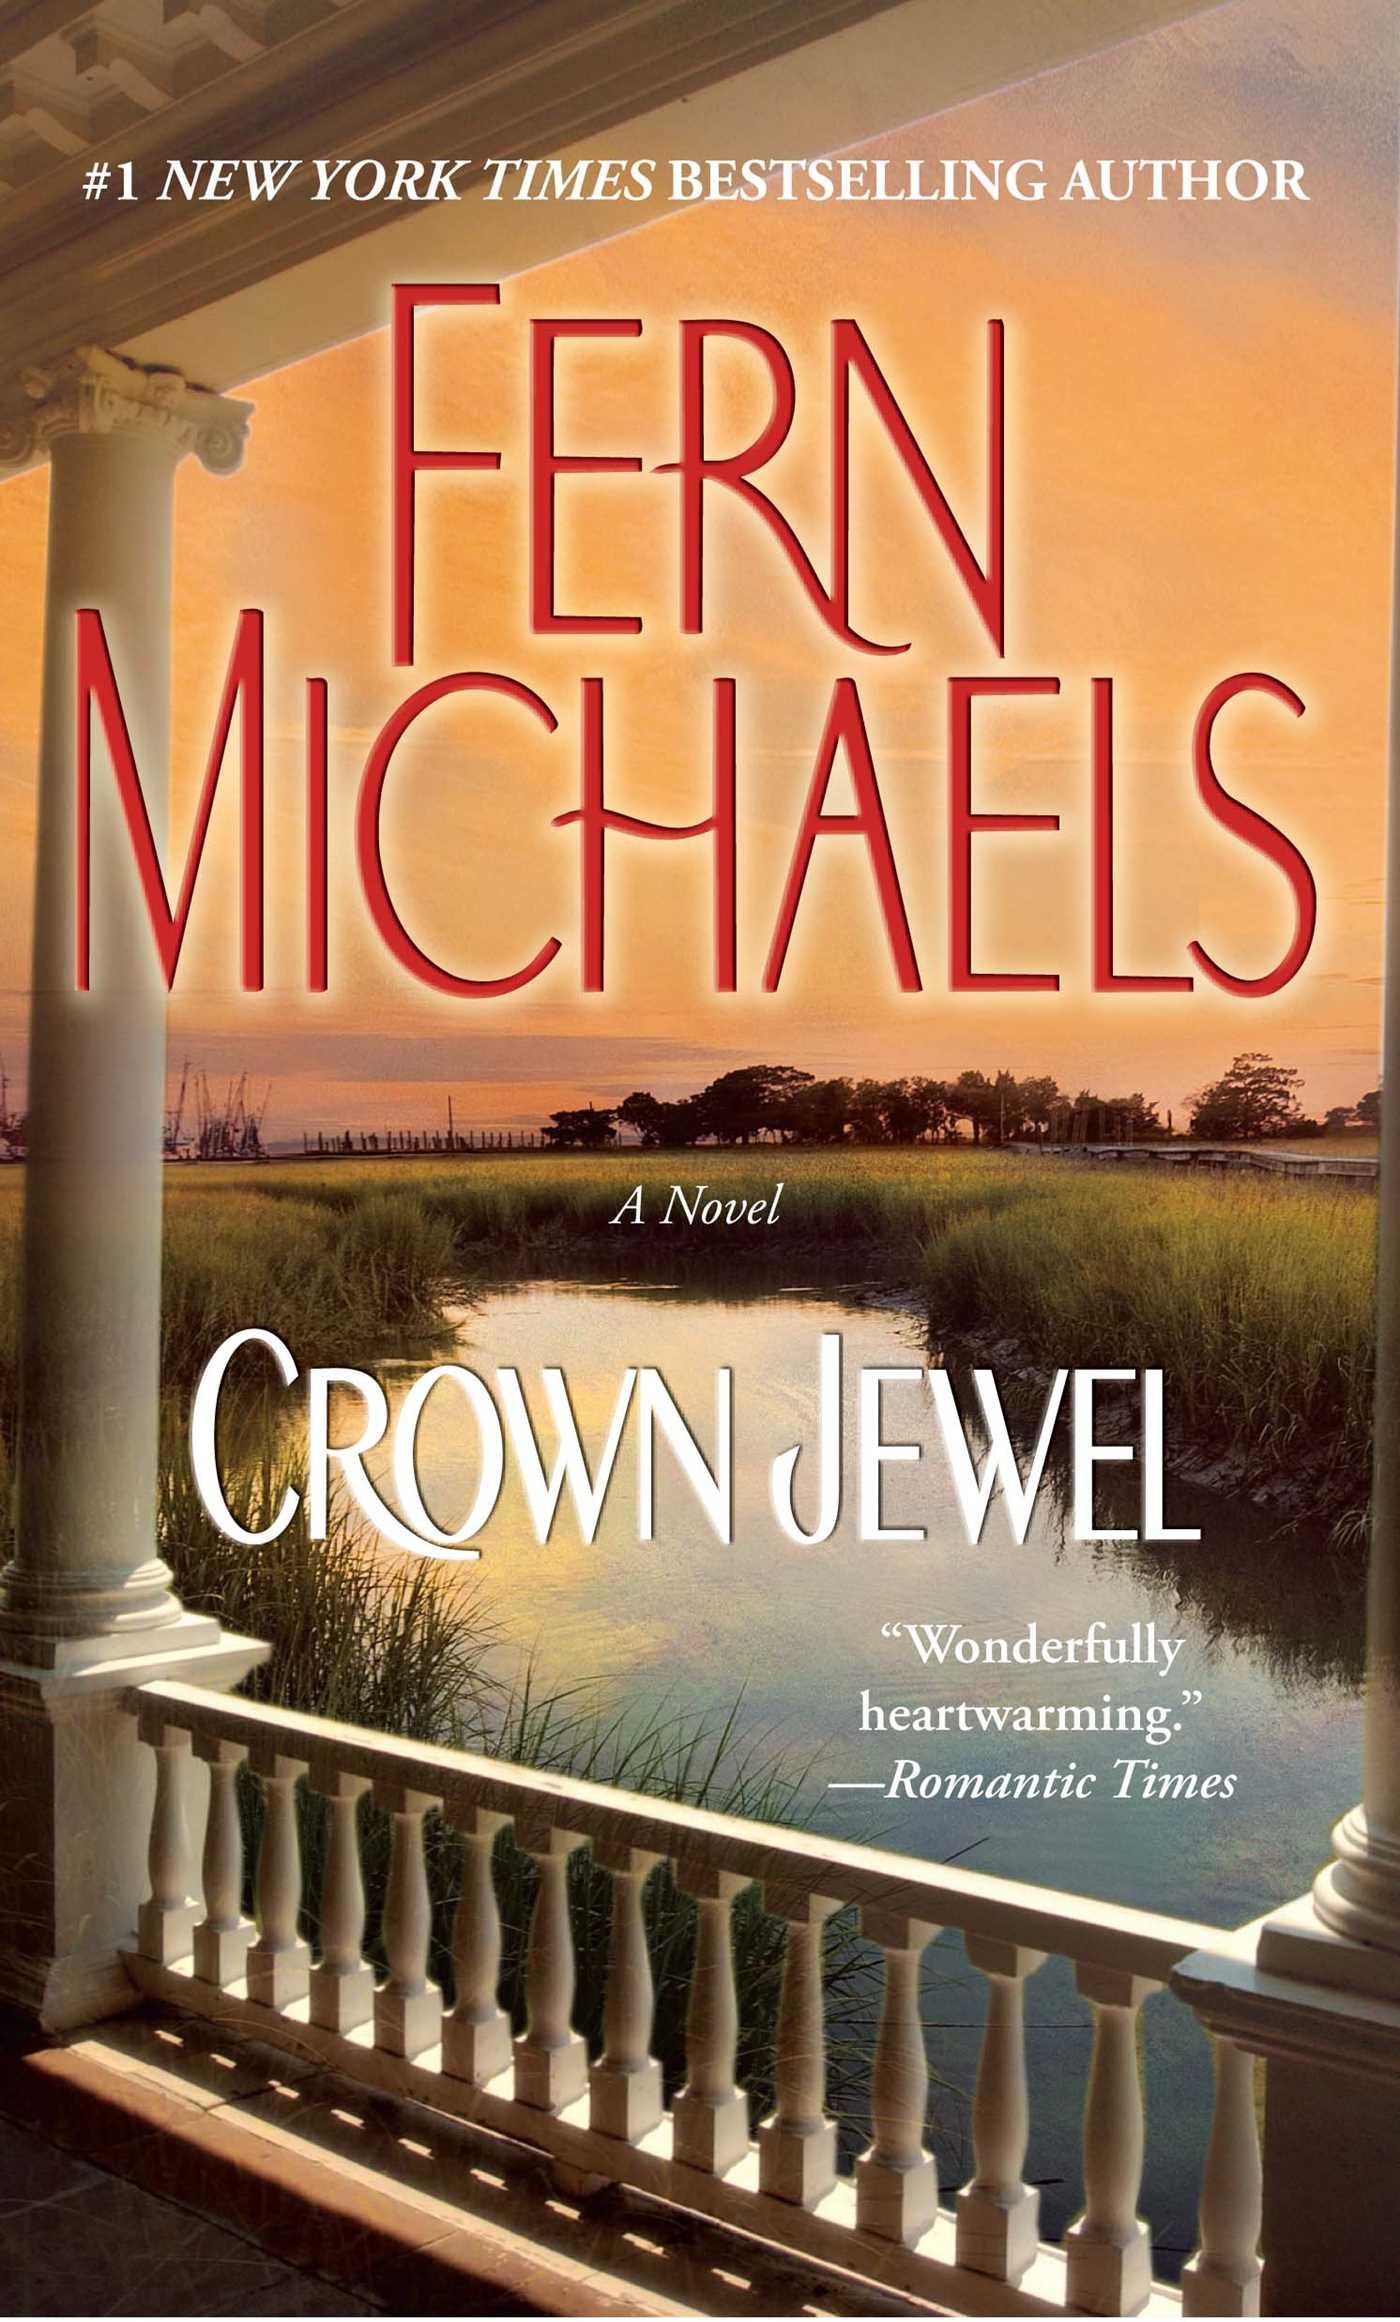 Crown jewel 9780743496483 hr